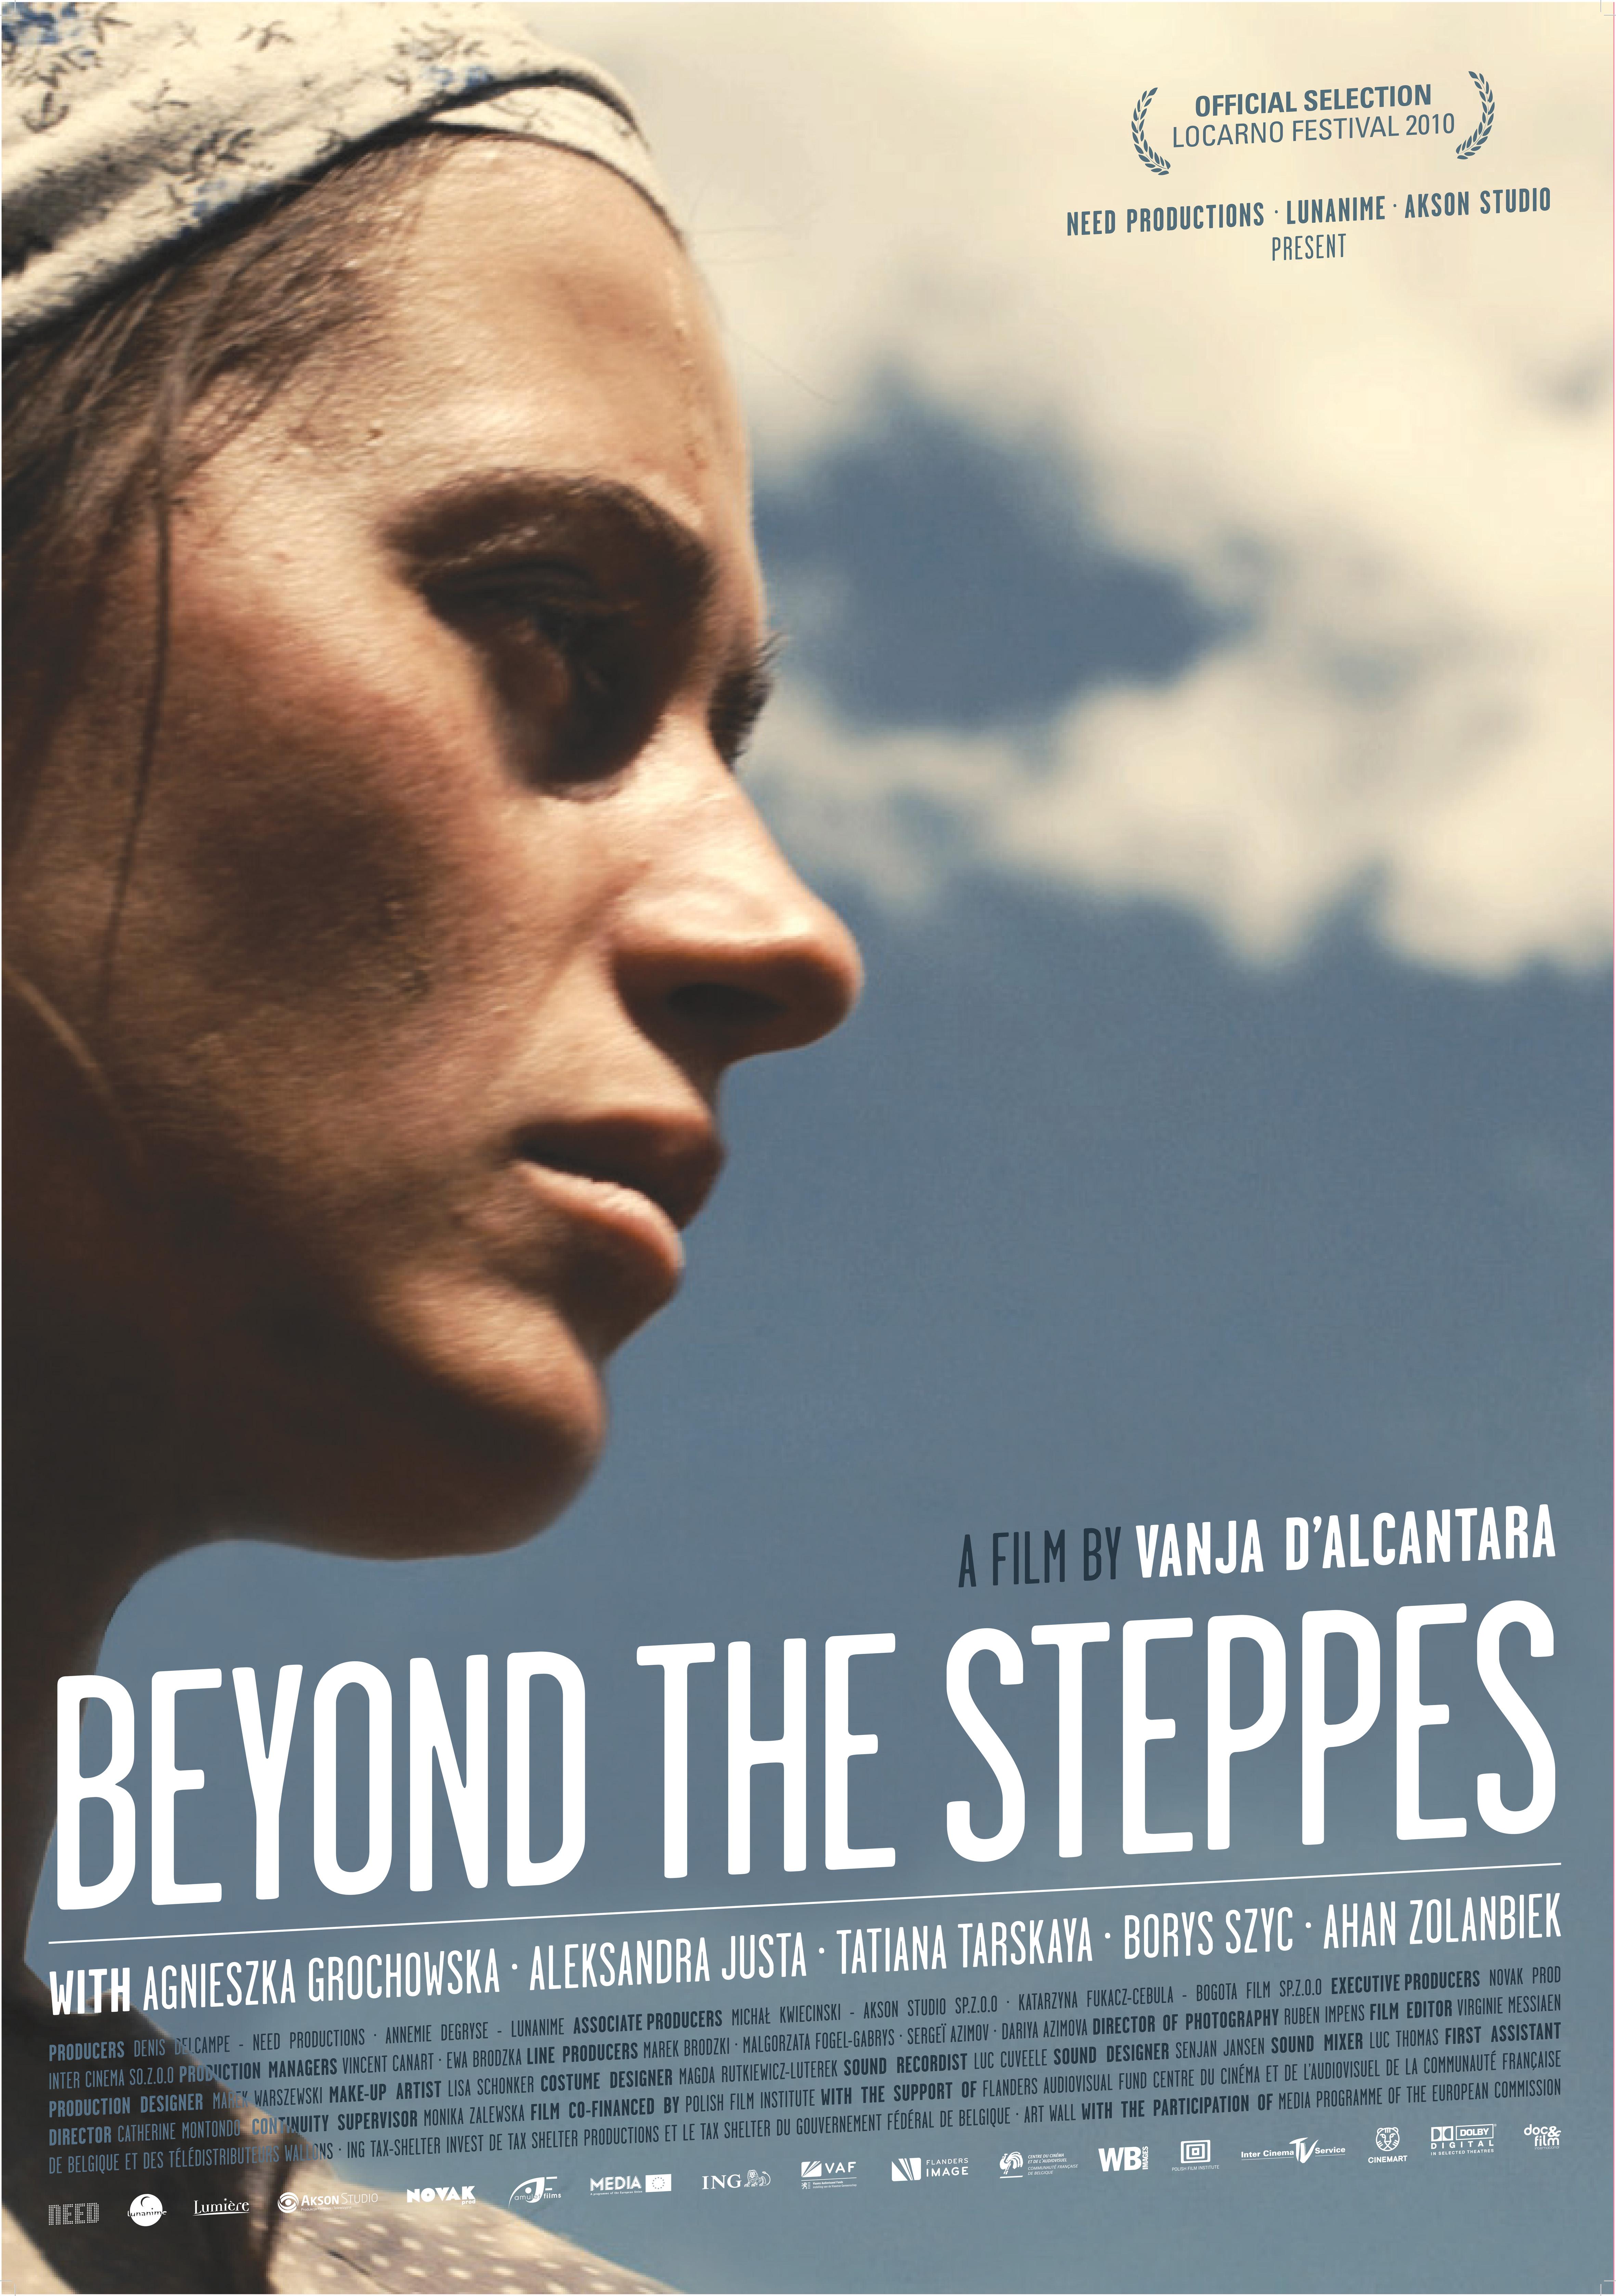 BeyondTheSteppes 70x100. Beyond The Steppes   lunanime